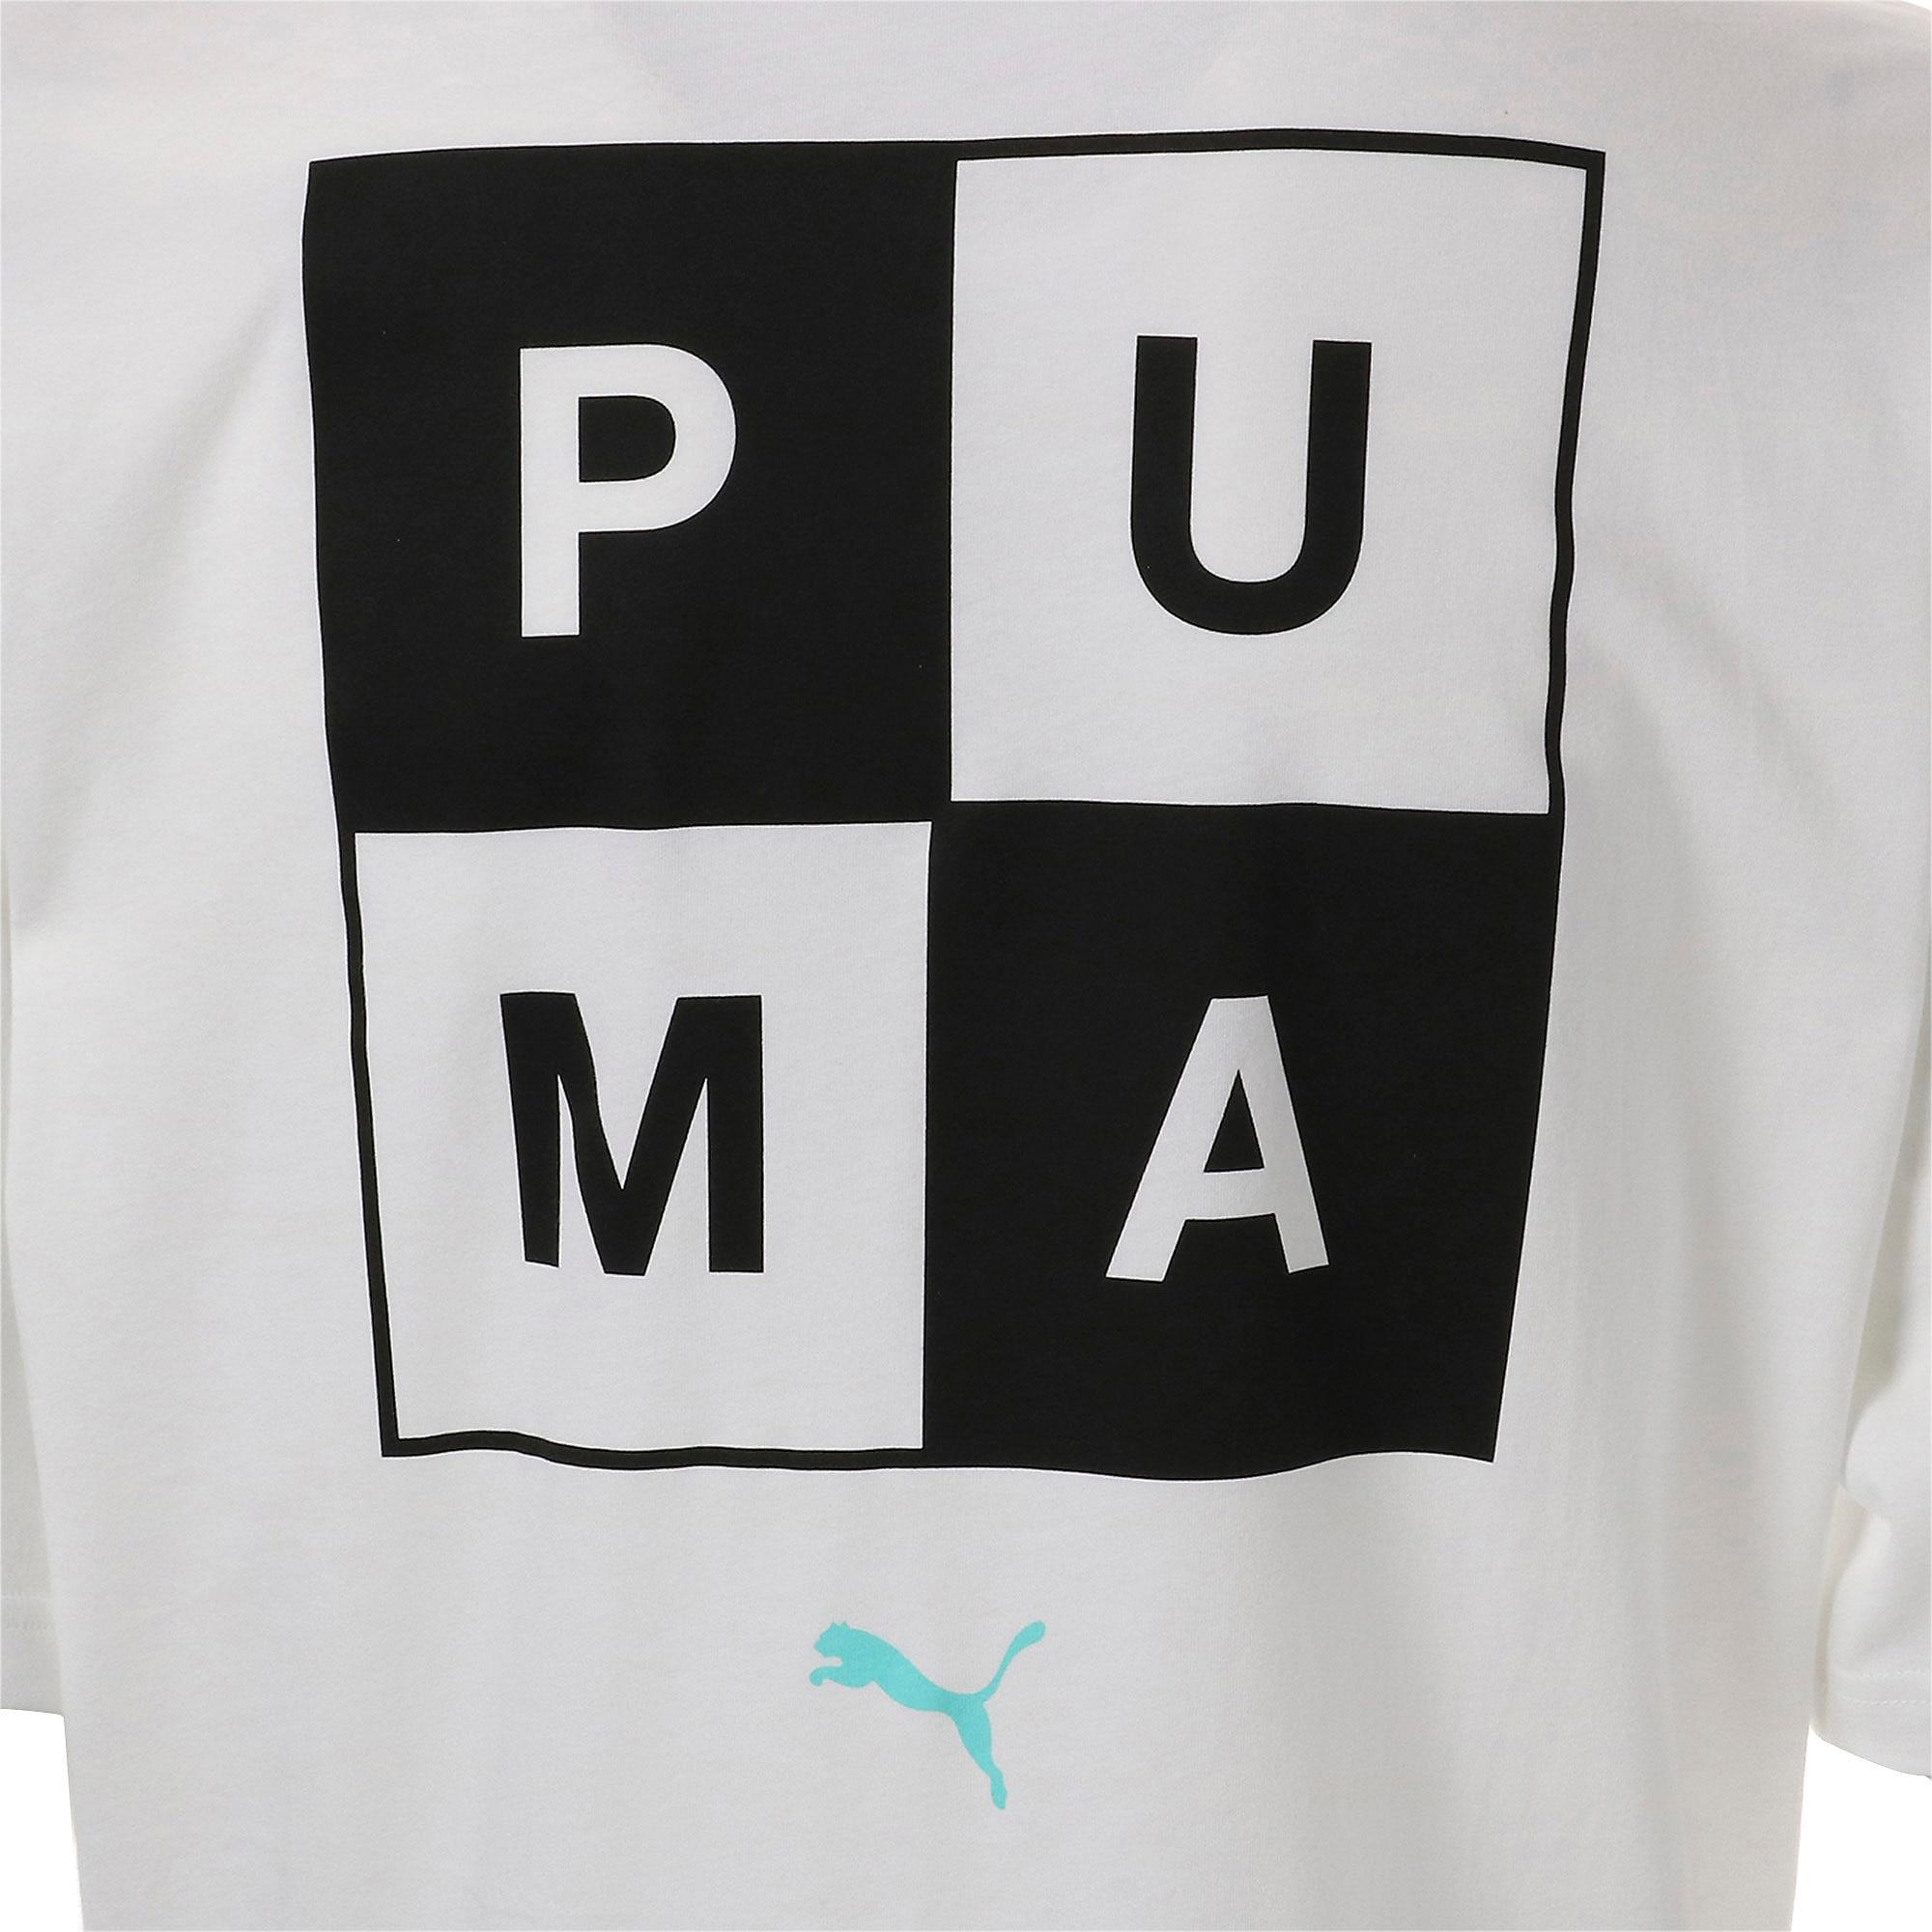 Thumbnail 6 of CHECKBOARD TEE, Puma White, medium-JPN